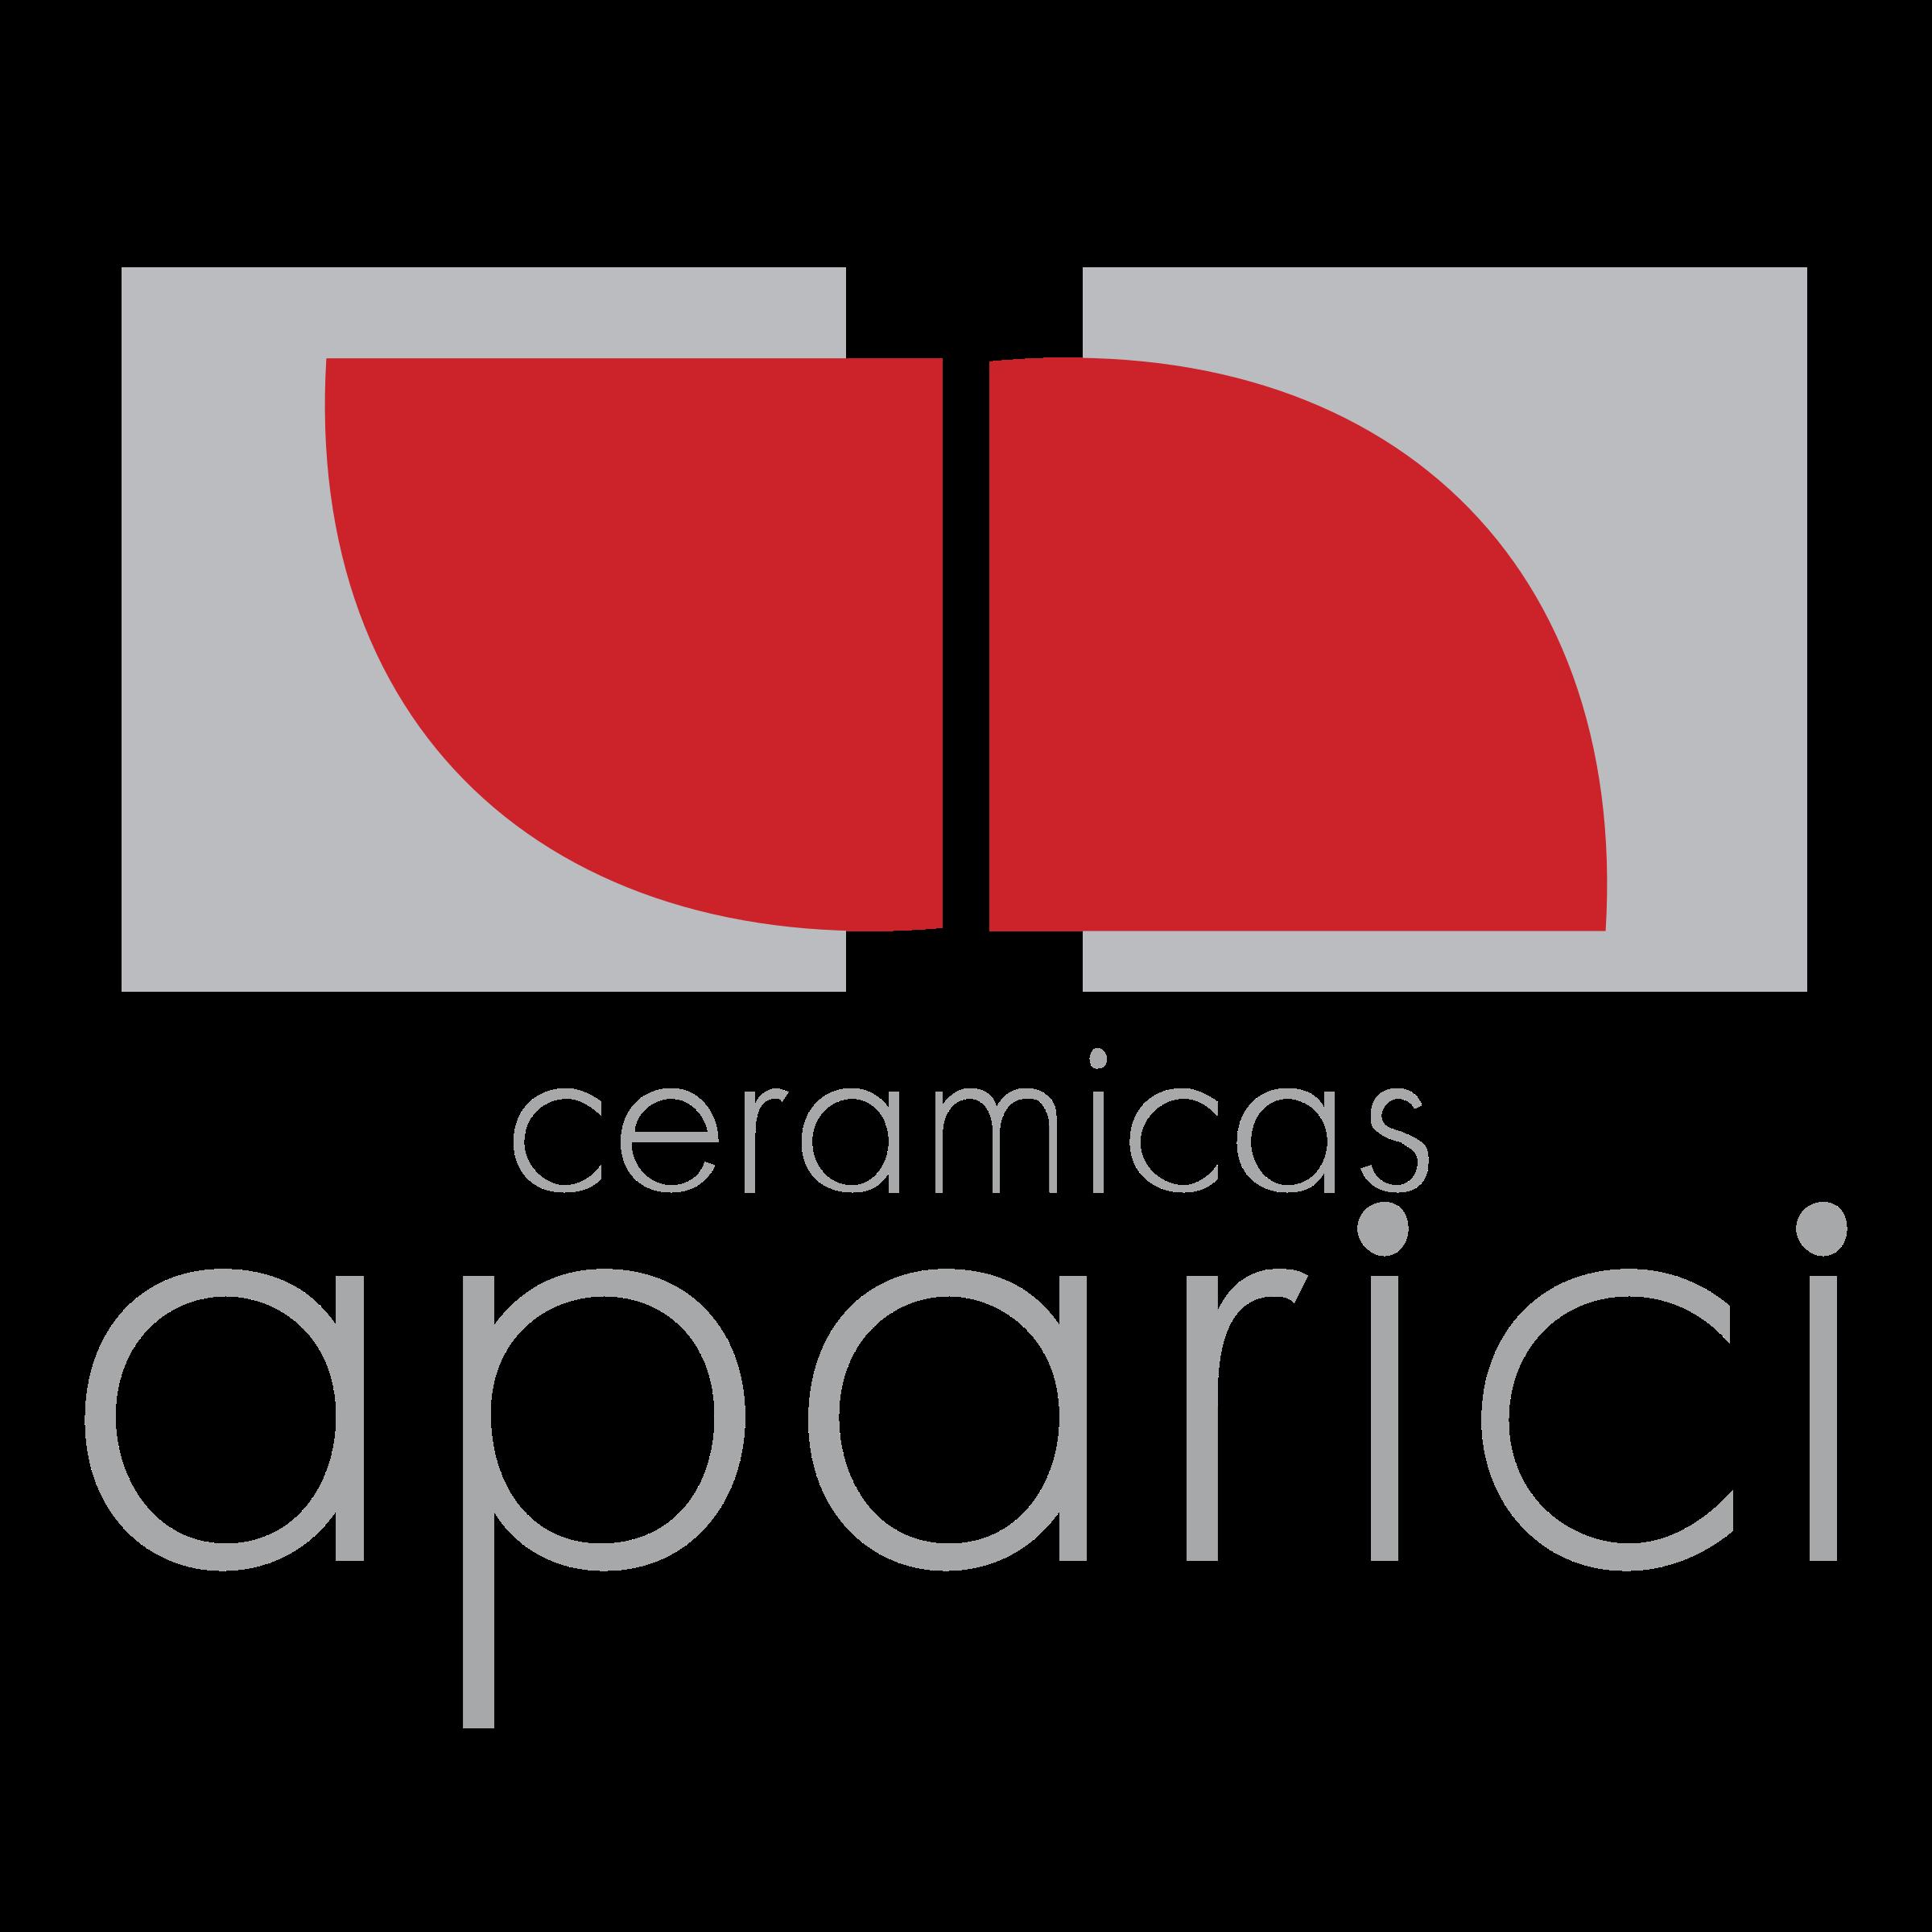 aparici logo.png